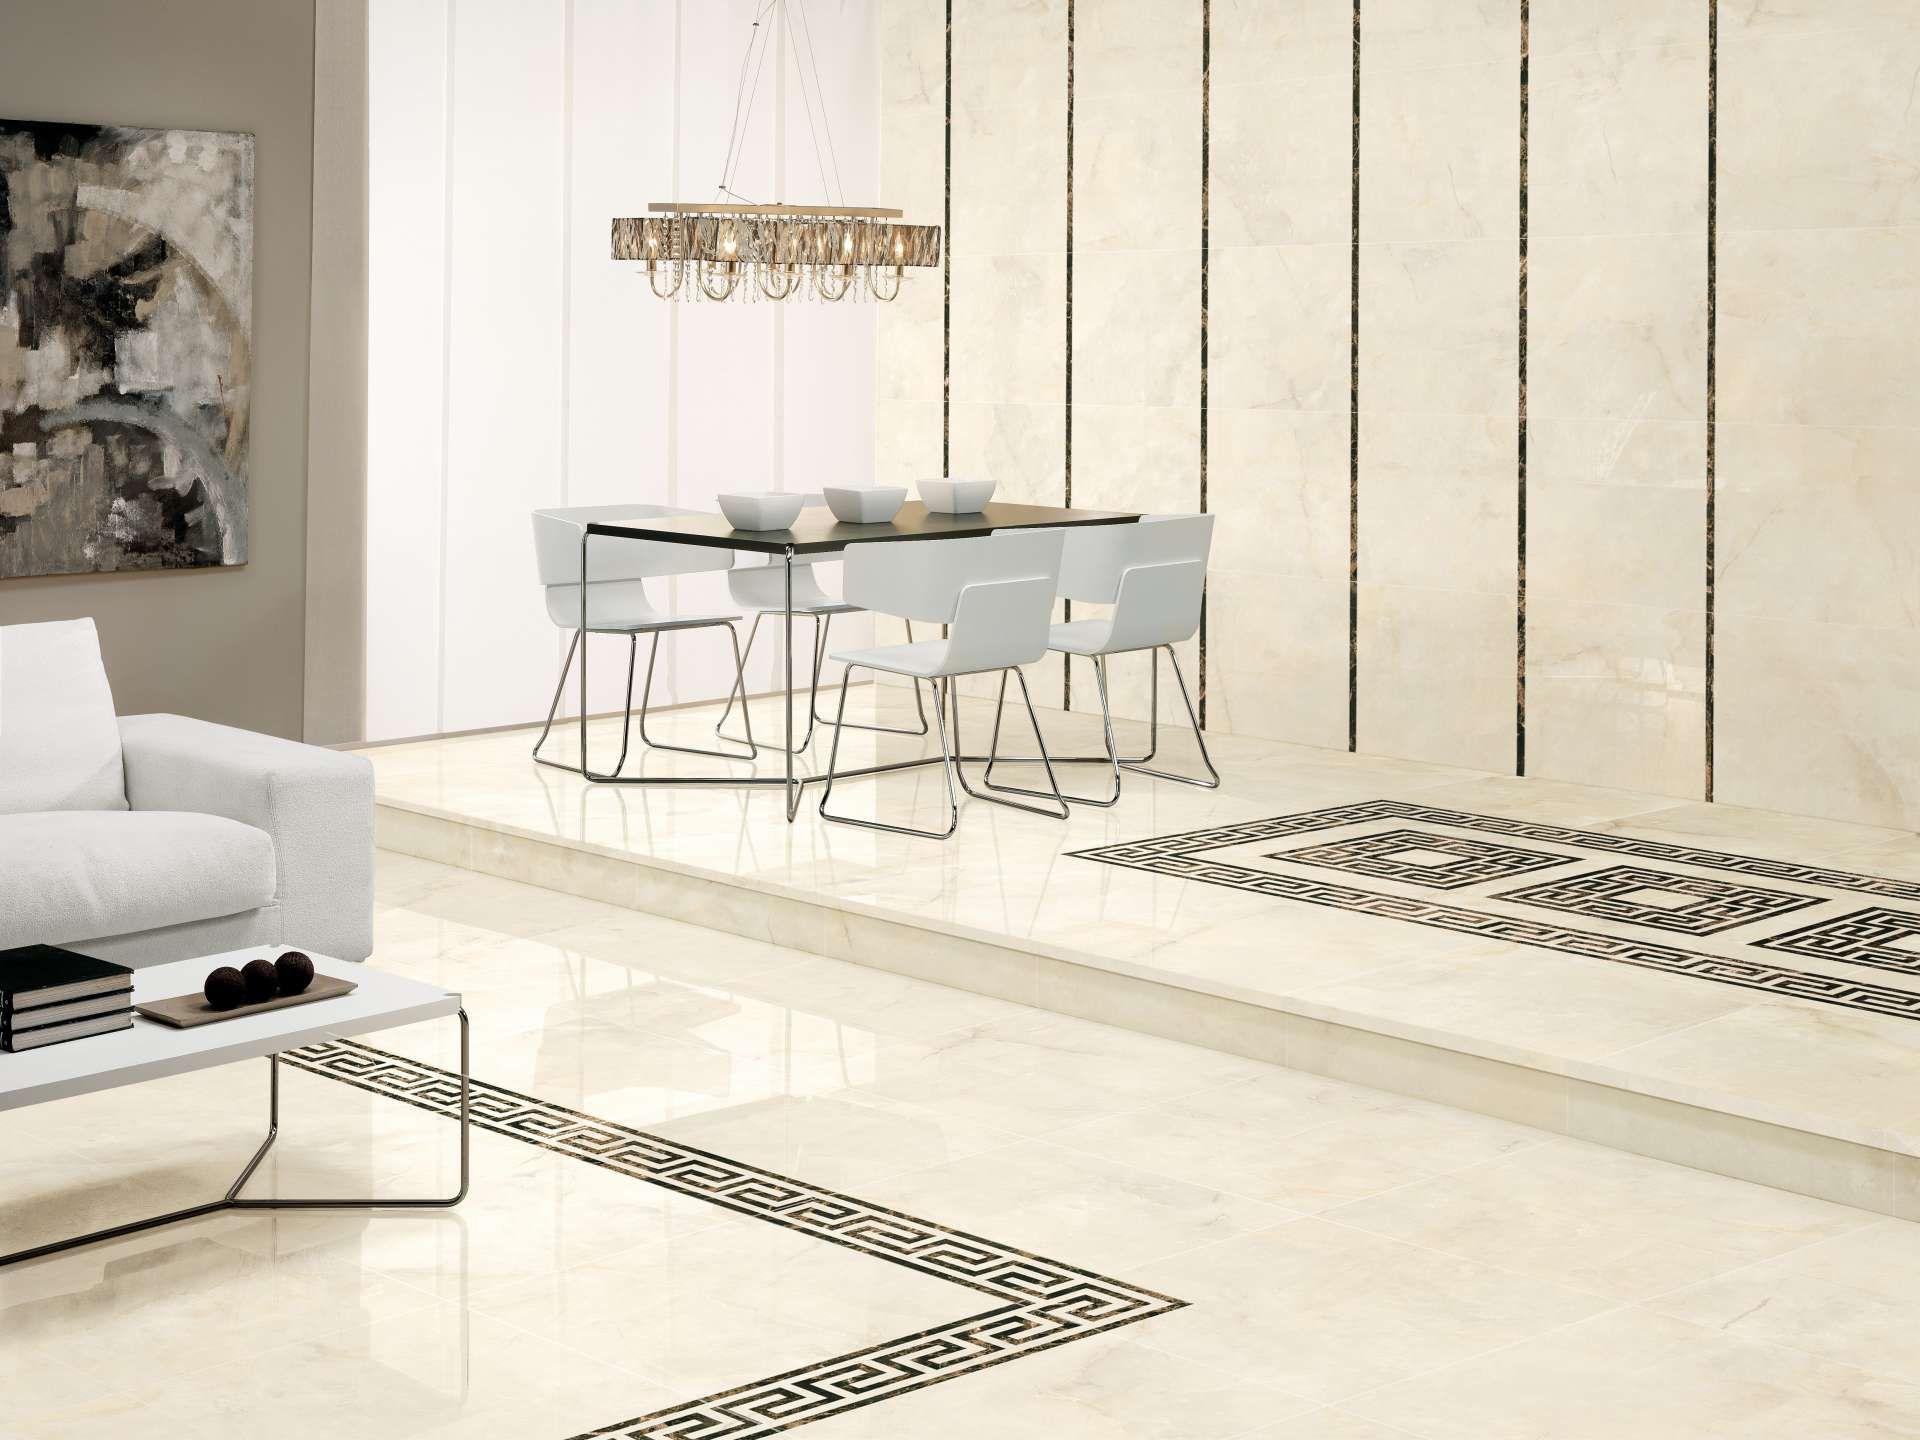 Room done in Peronda Museum Onice Tile - Light Onyx. | Bathroom ...